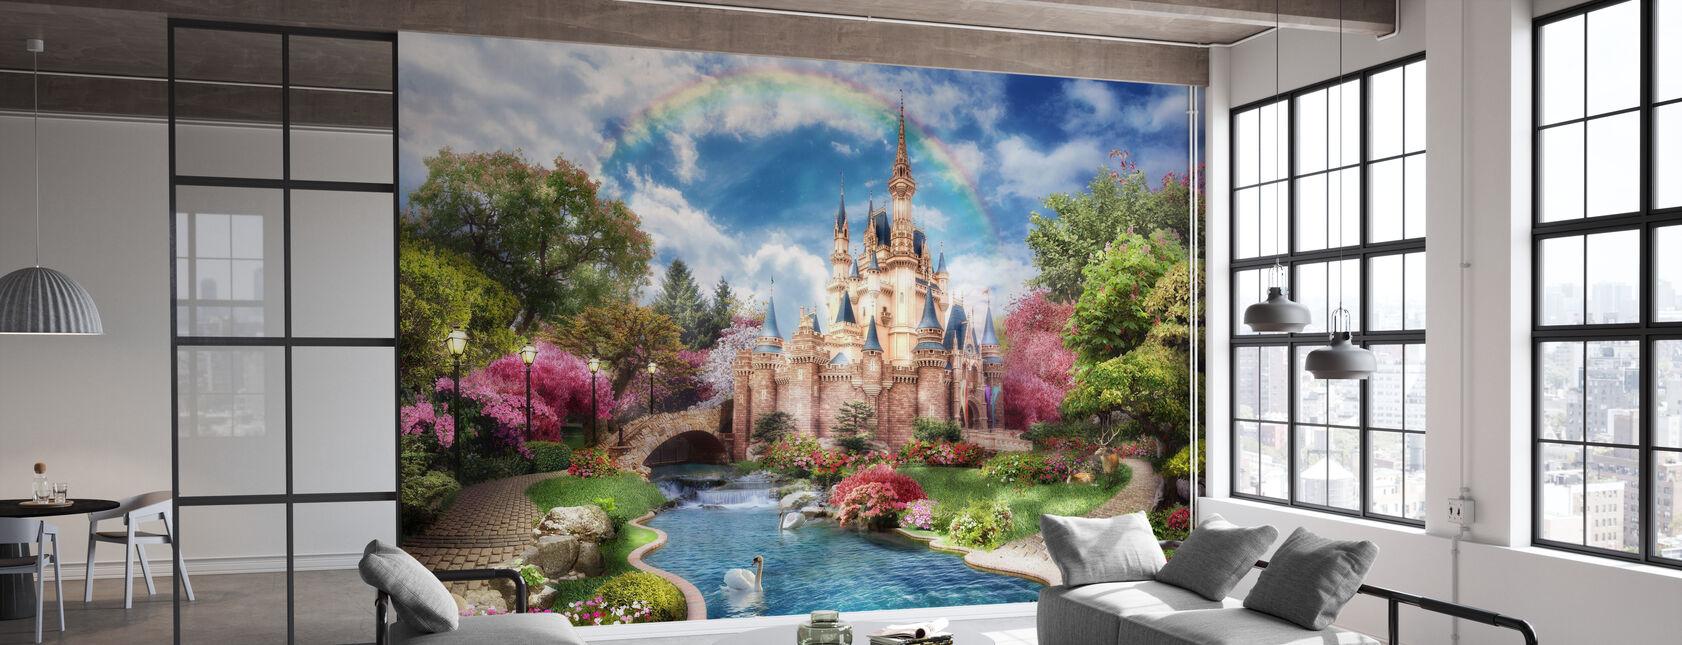 Magic Castle - Wallpaper - Office